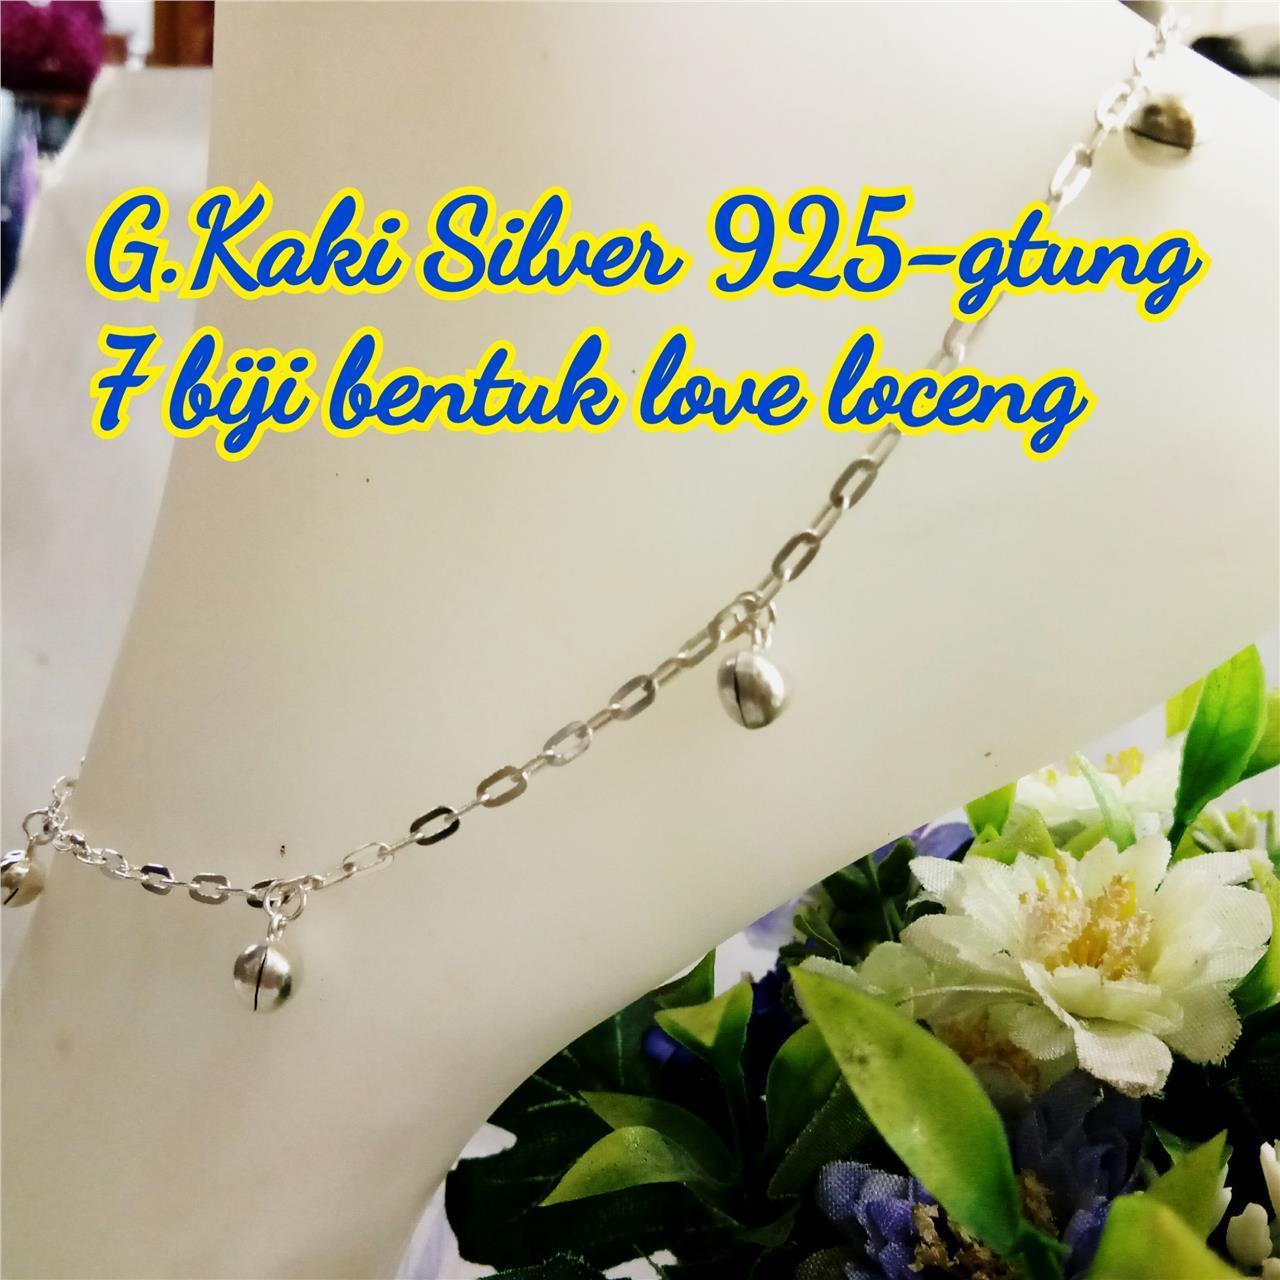 gelang kaki silver 925 7 biji bentuk end 1 29 2019 3 15 pm